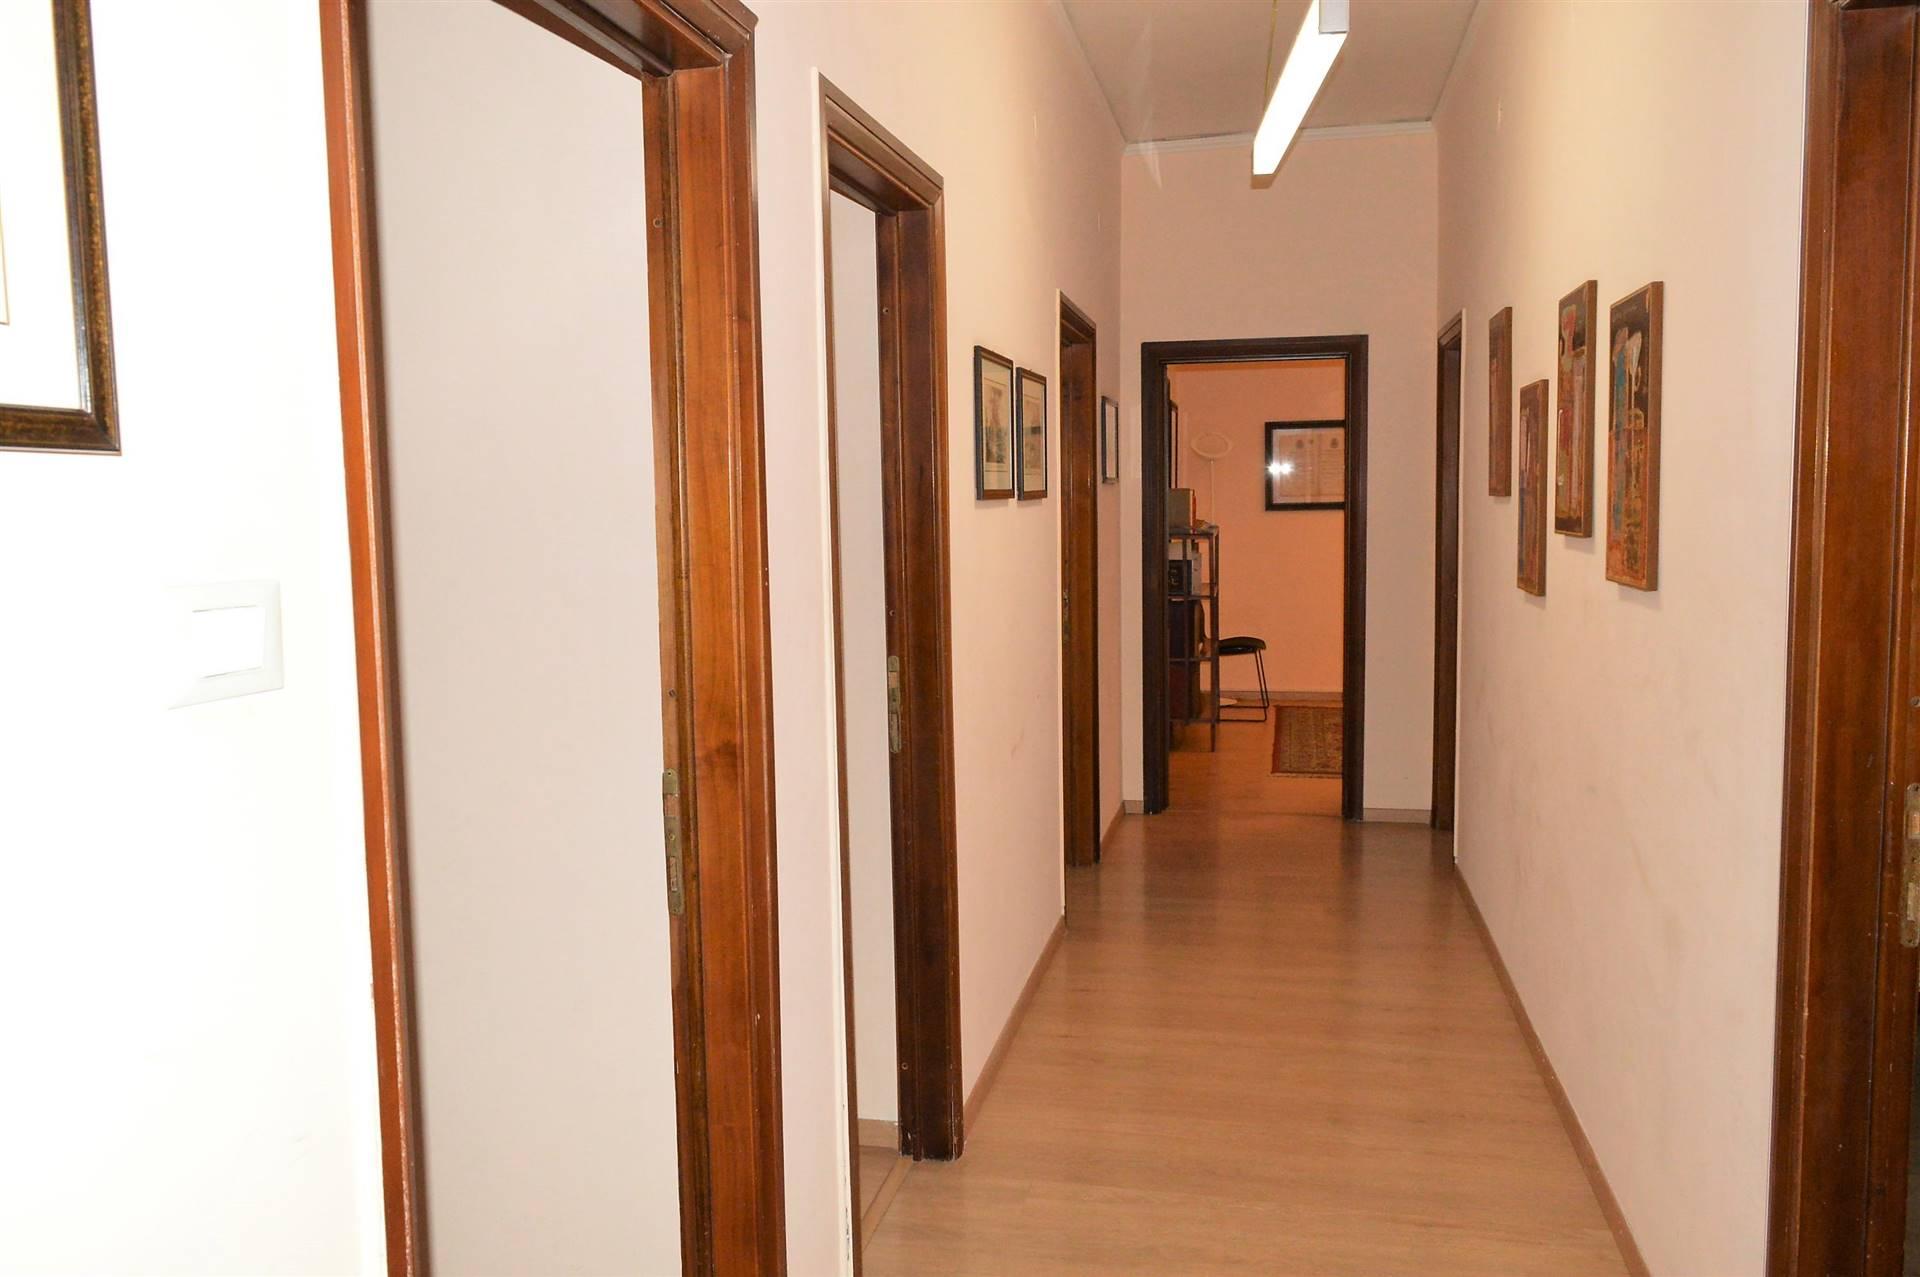 AF851C-Ufficio-SANTA-MARIA-CAPUA-VETERE-Via-Giuseppe-Bonaparte